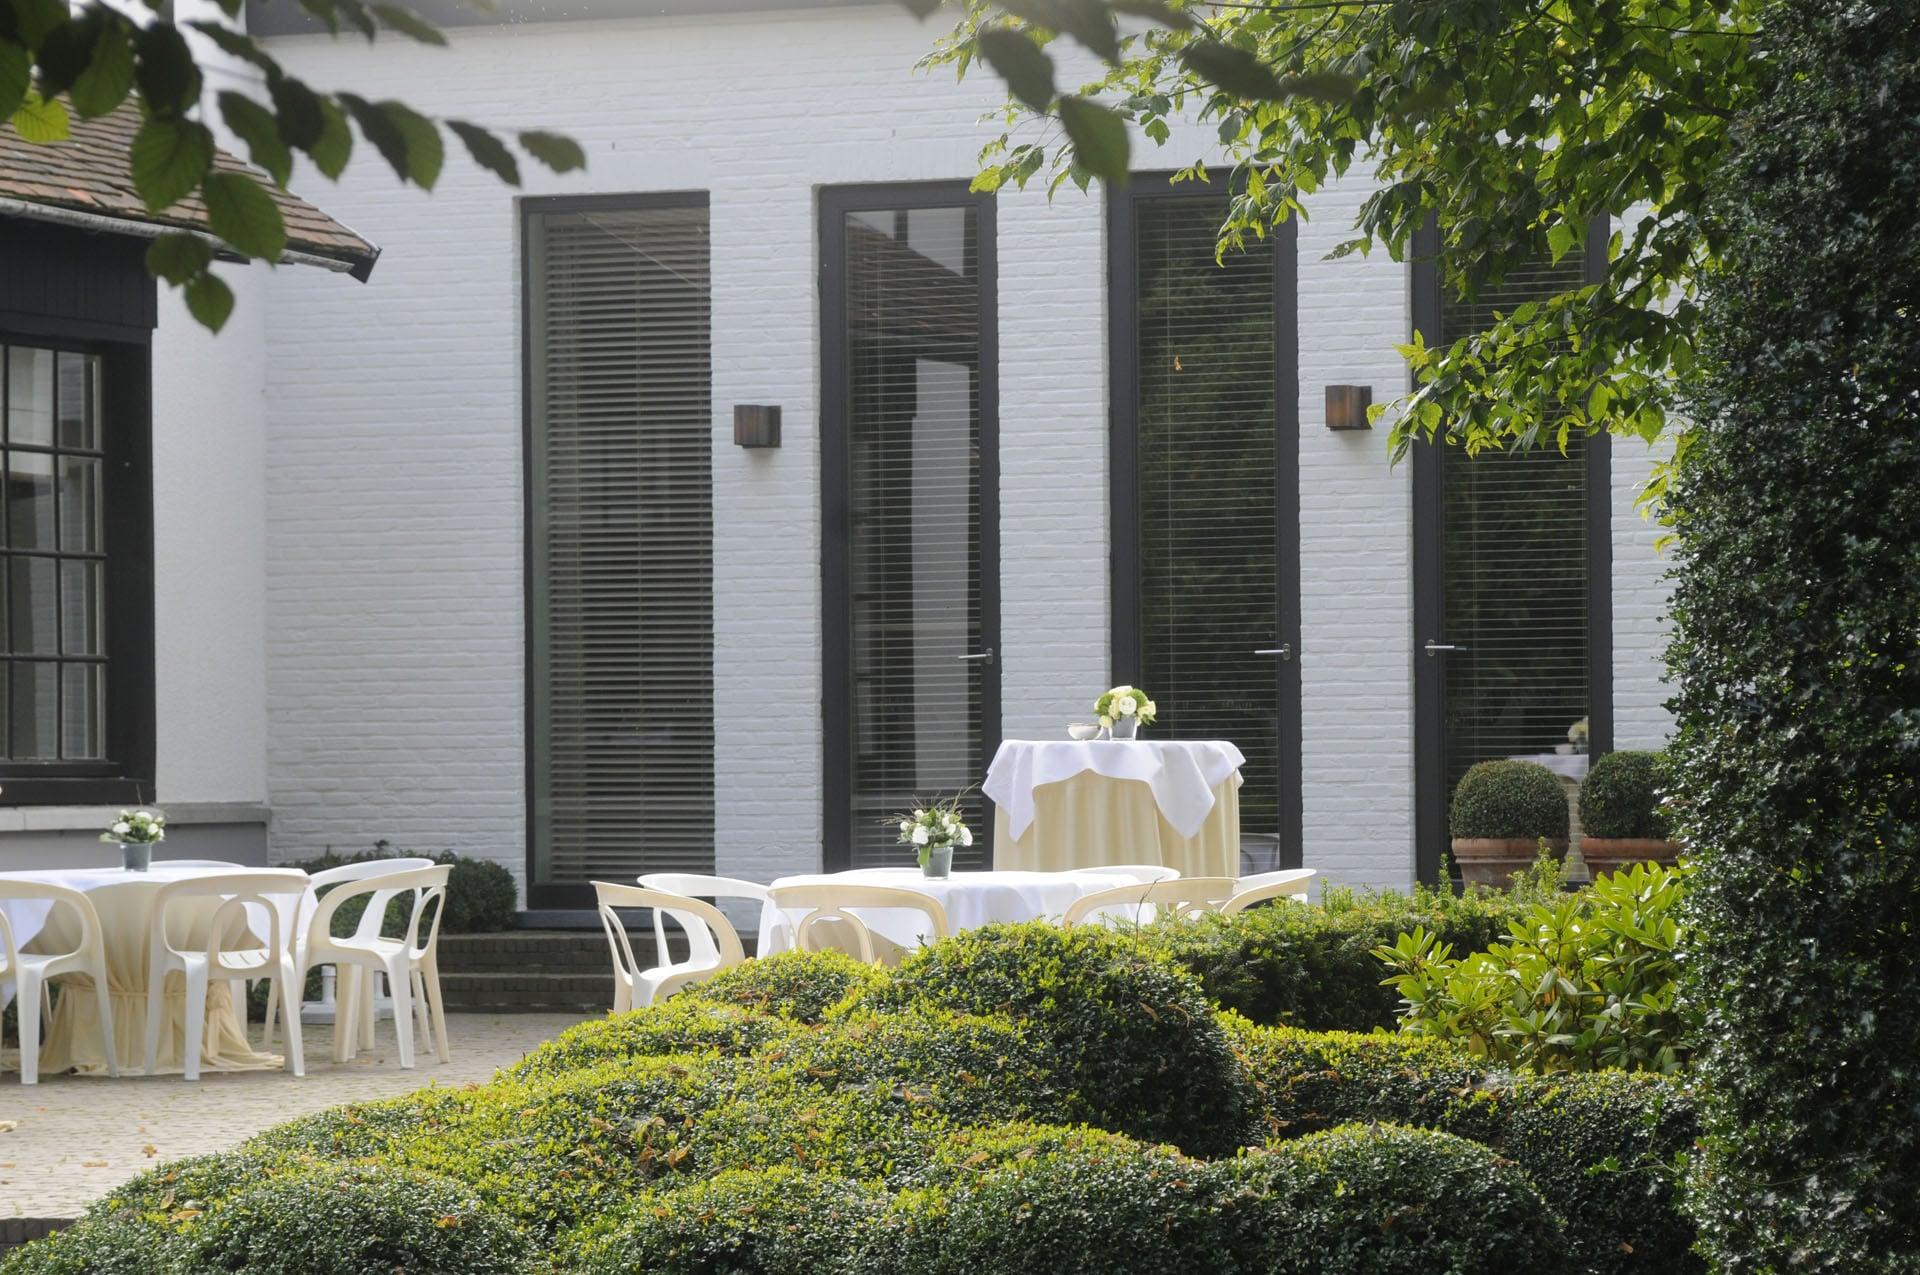 Tuin - Salons 't Groenhof